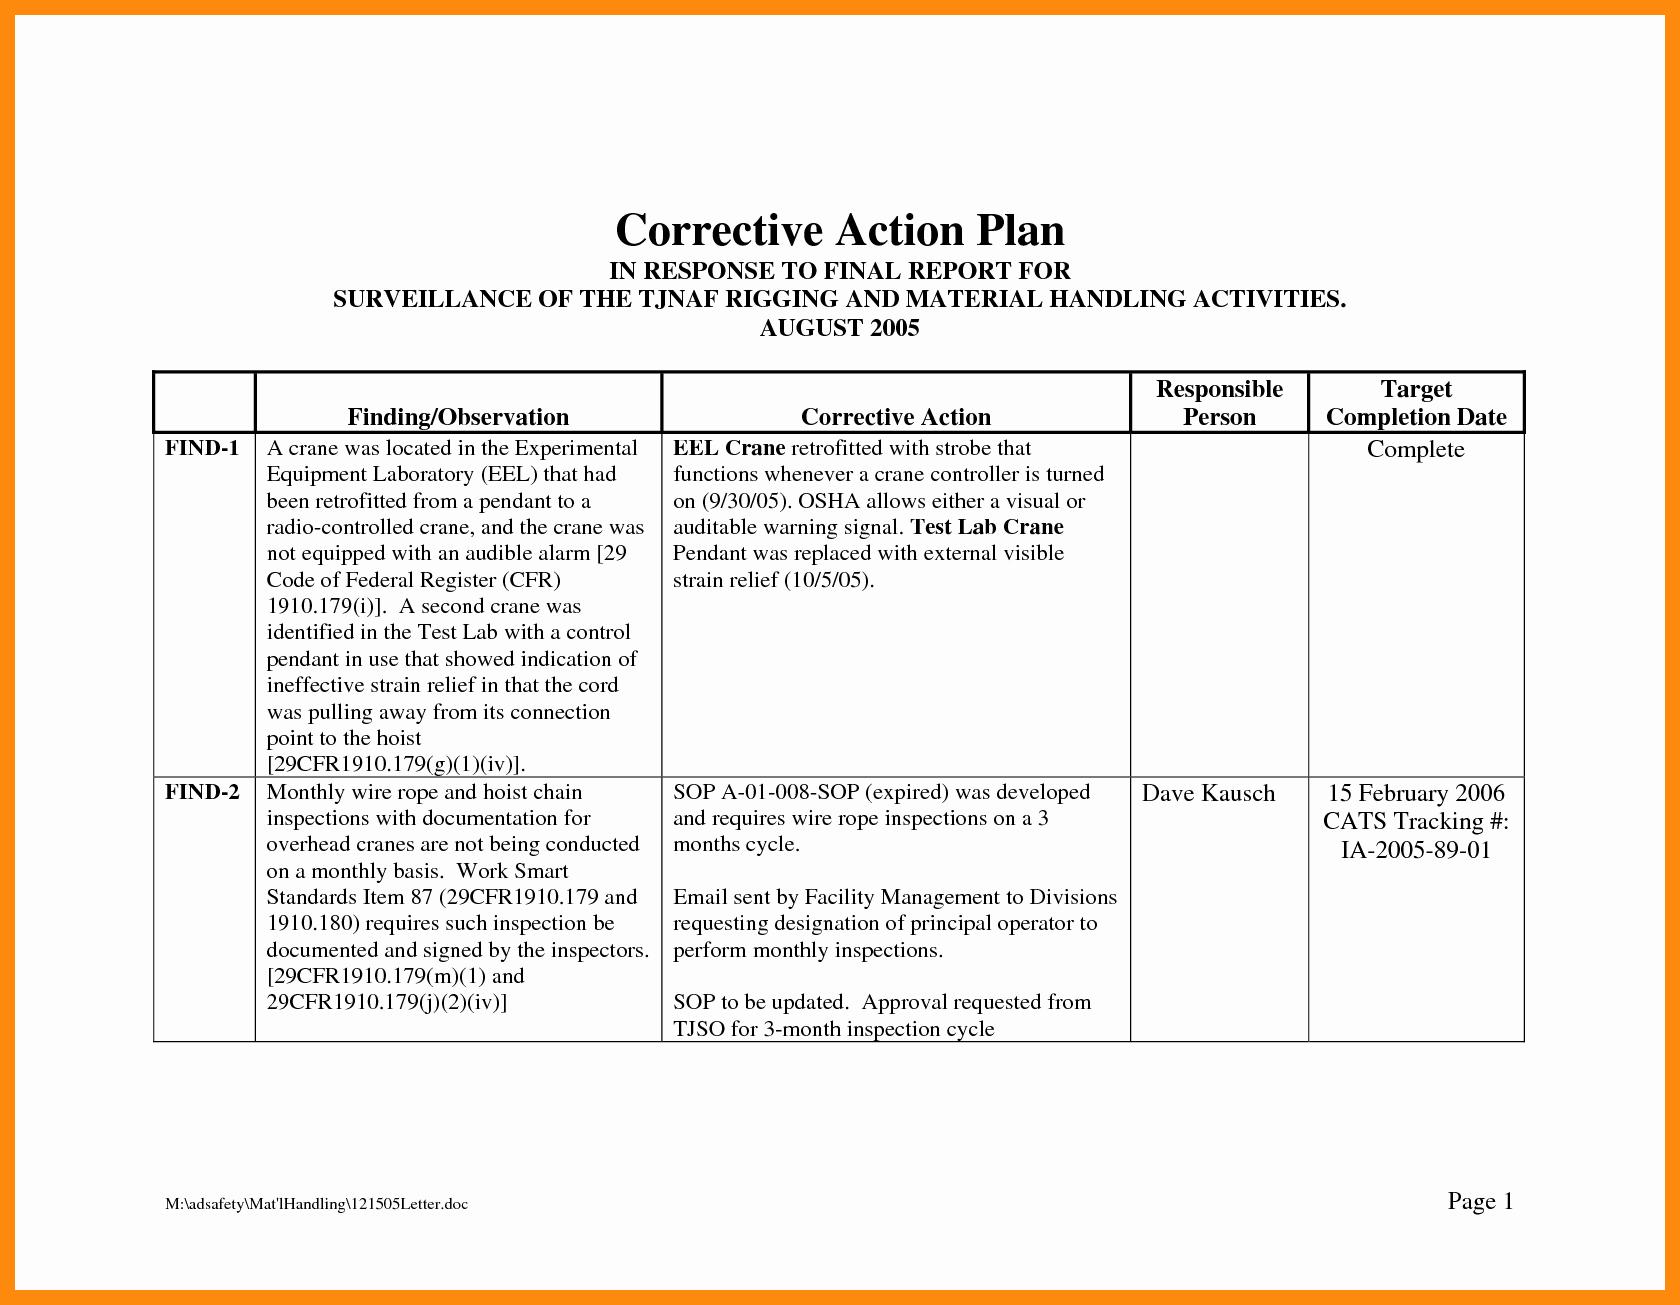 Corrective Action Plan Template Lovely Corrective Action Plan